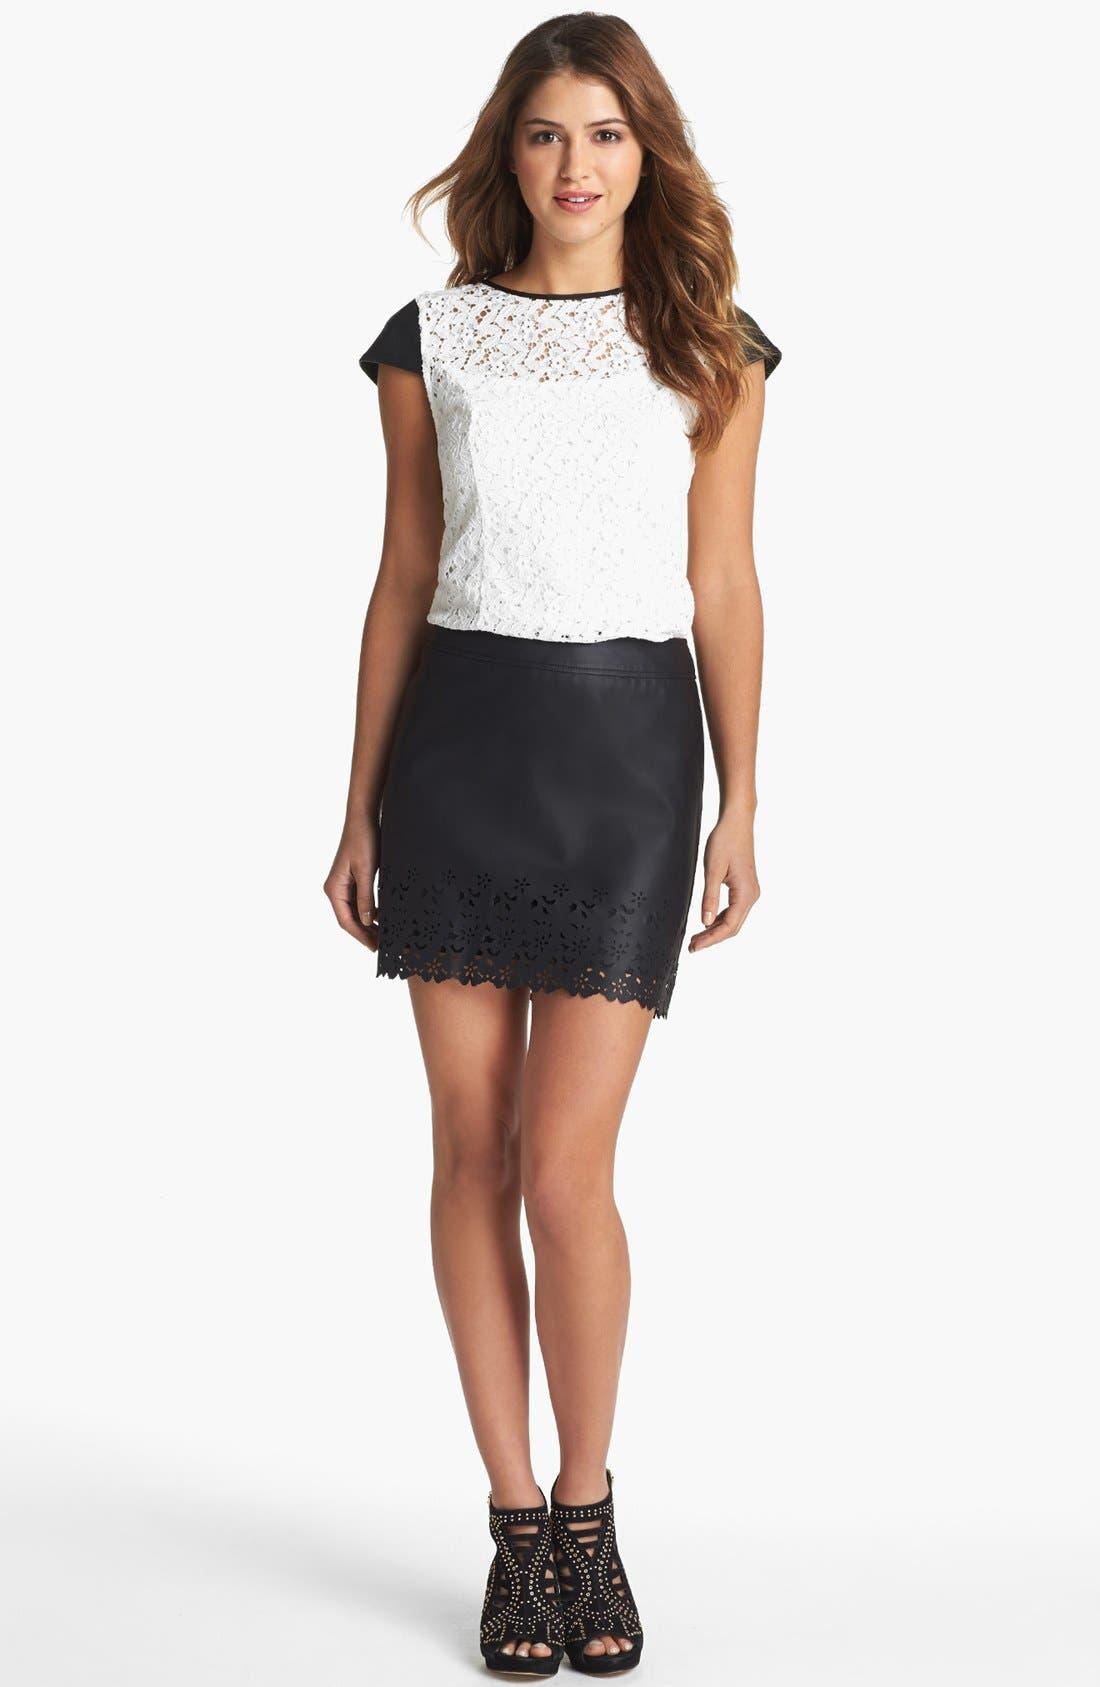 Main Image - Kensie Top & Miniskirt